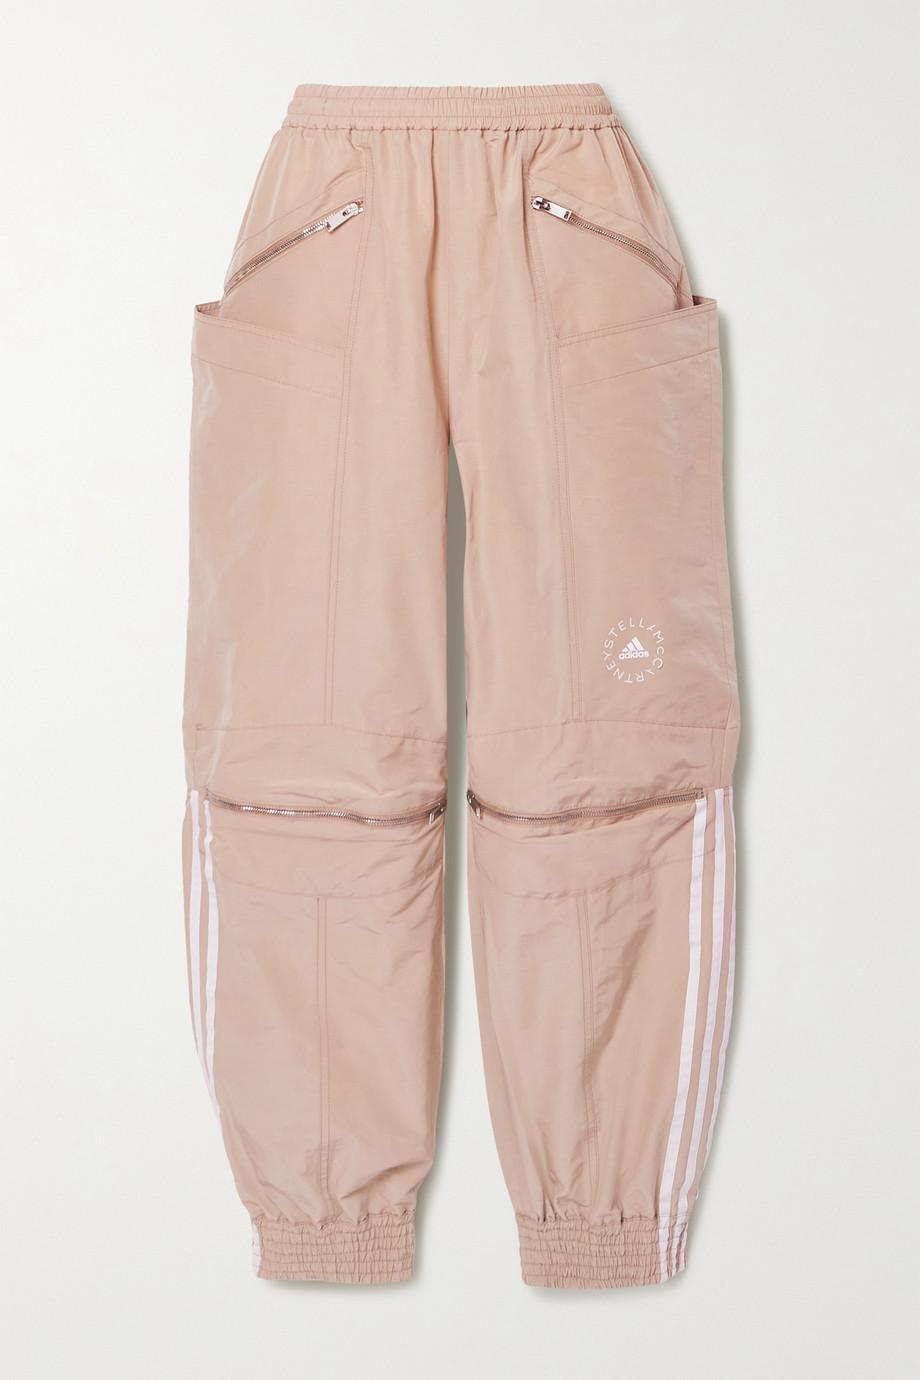 Stella McCartney + adidas Originals striped shell track pants